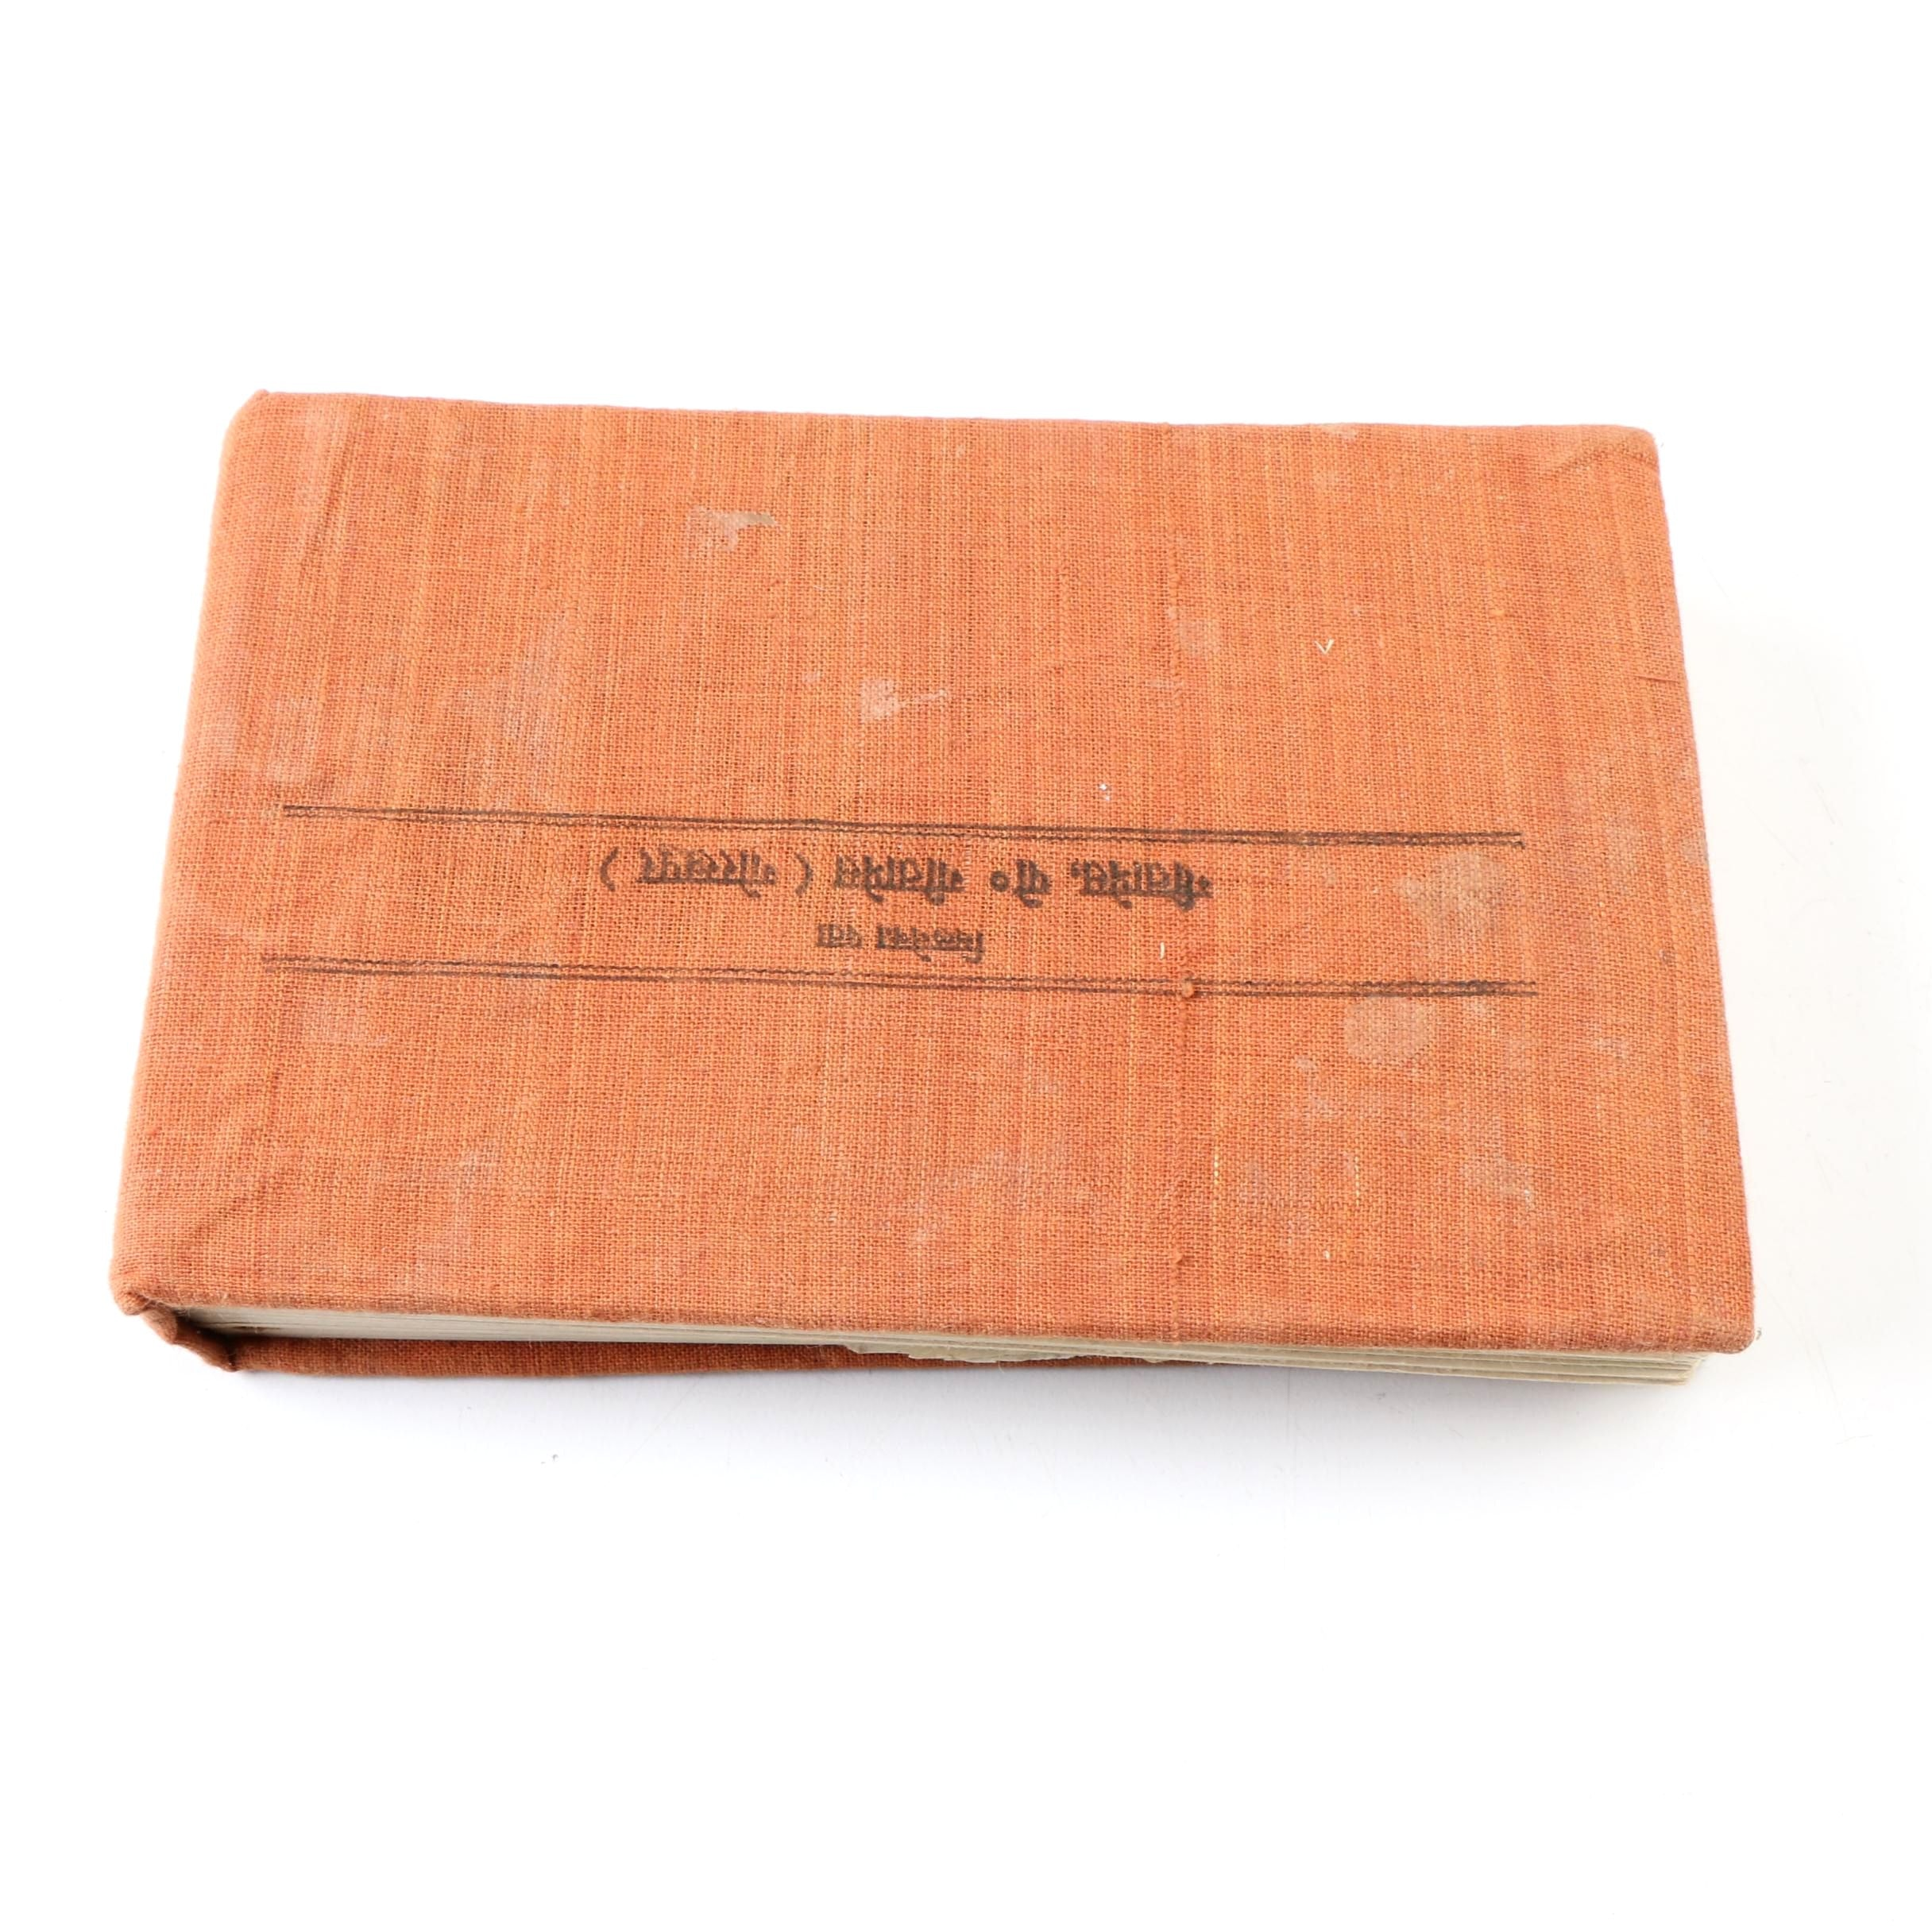 Indian Hindu Cloth on Board Bound Book